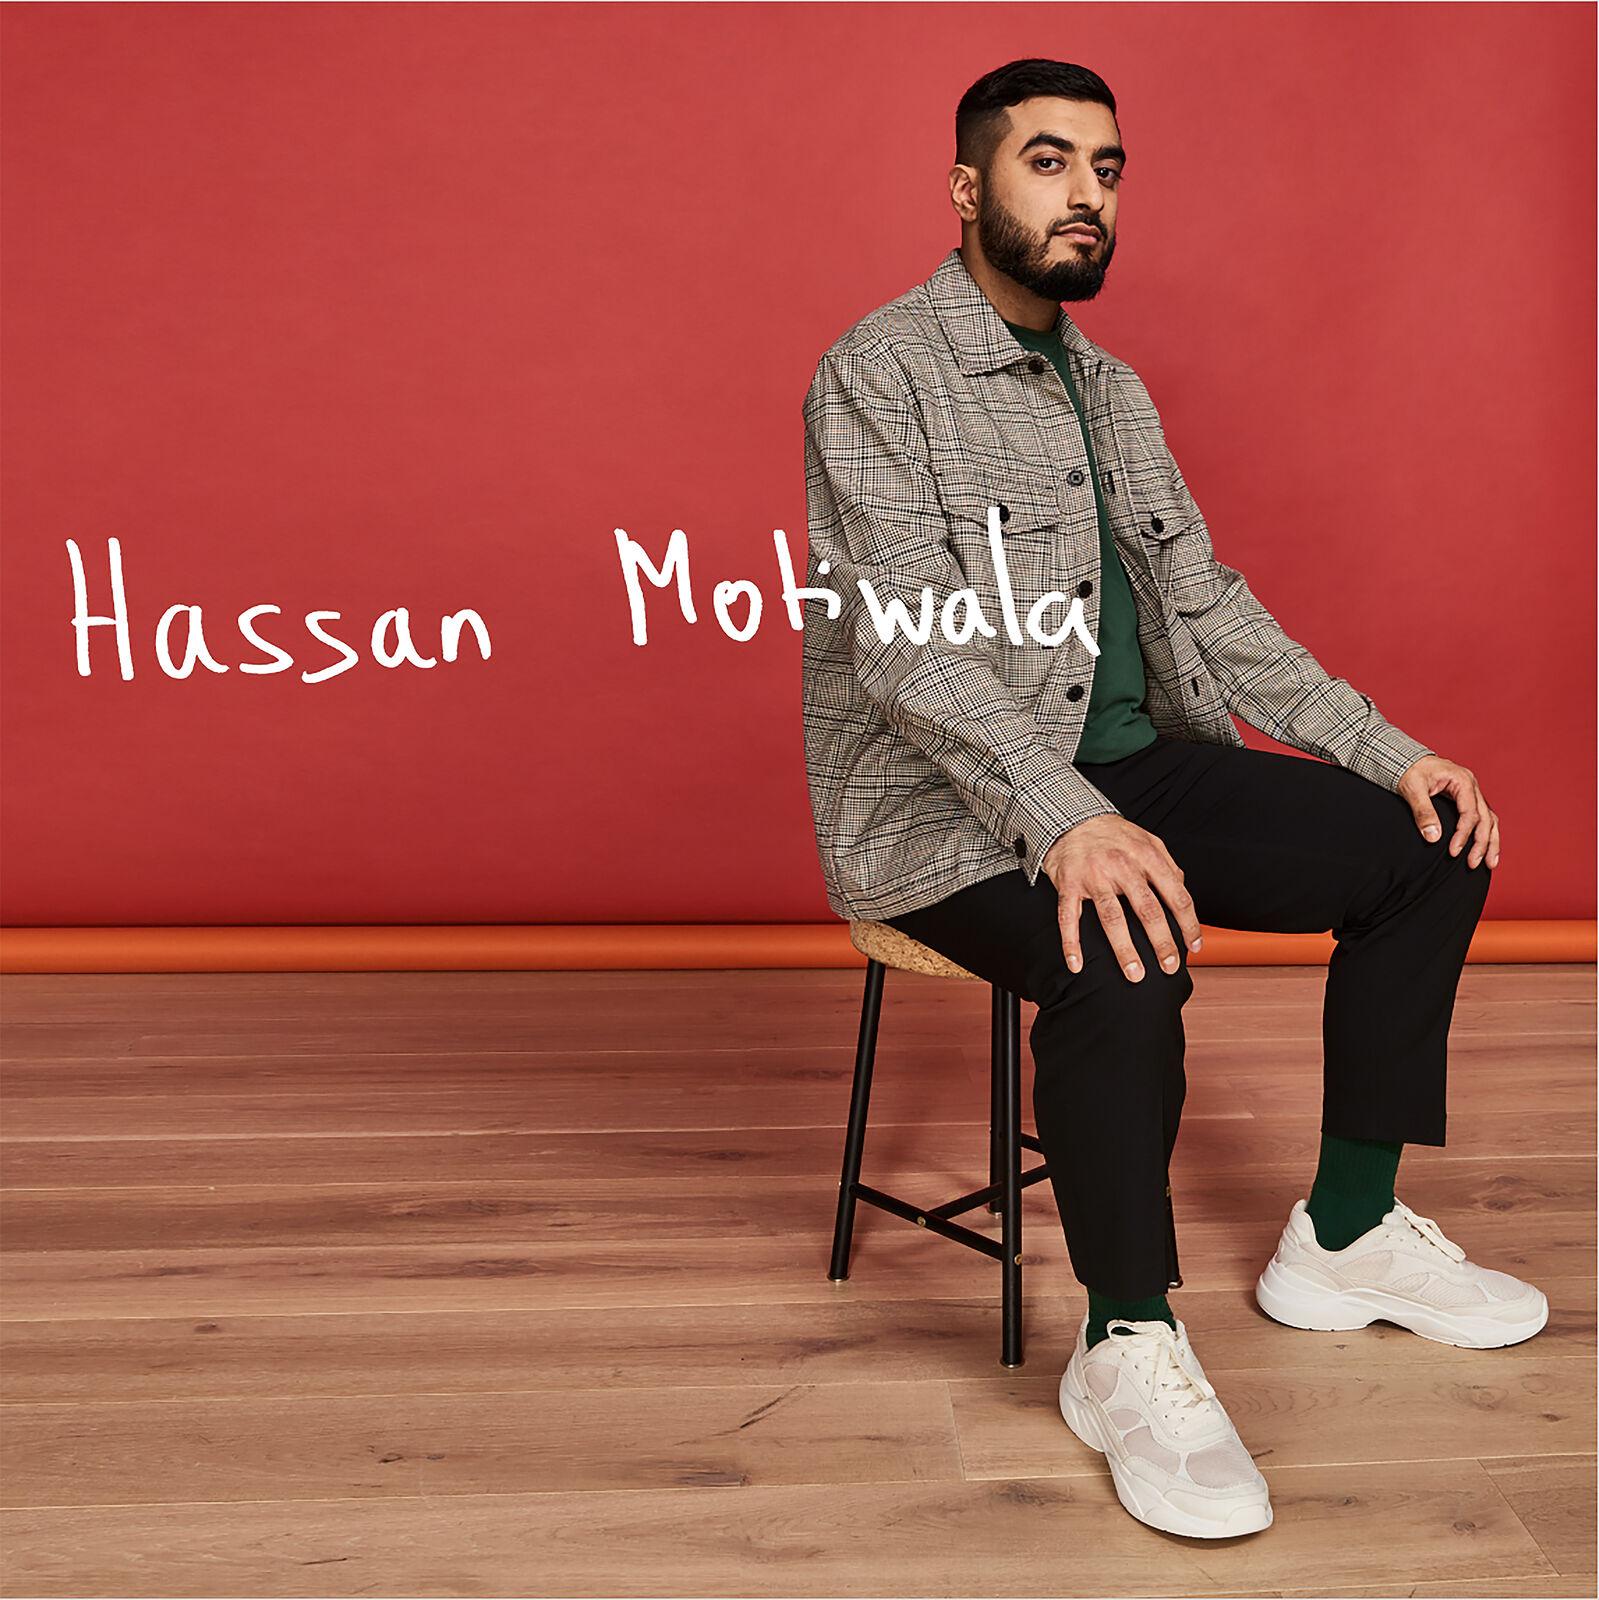 Hassan Motiwala : Own Your Future